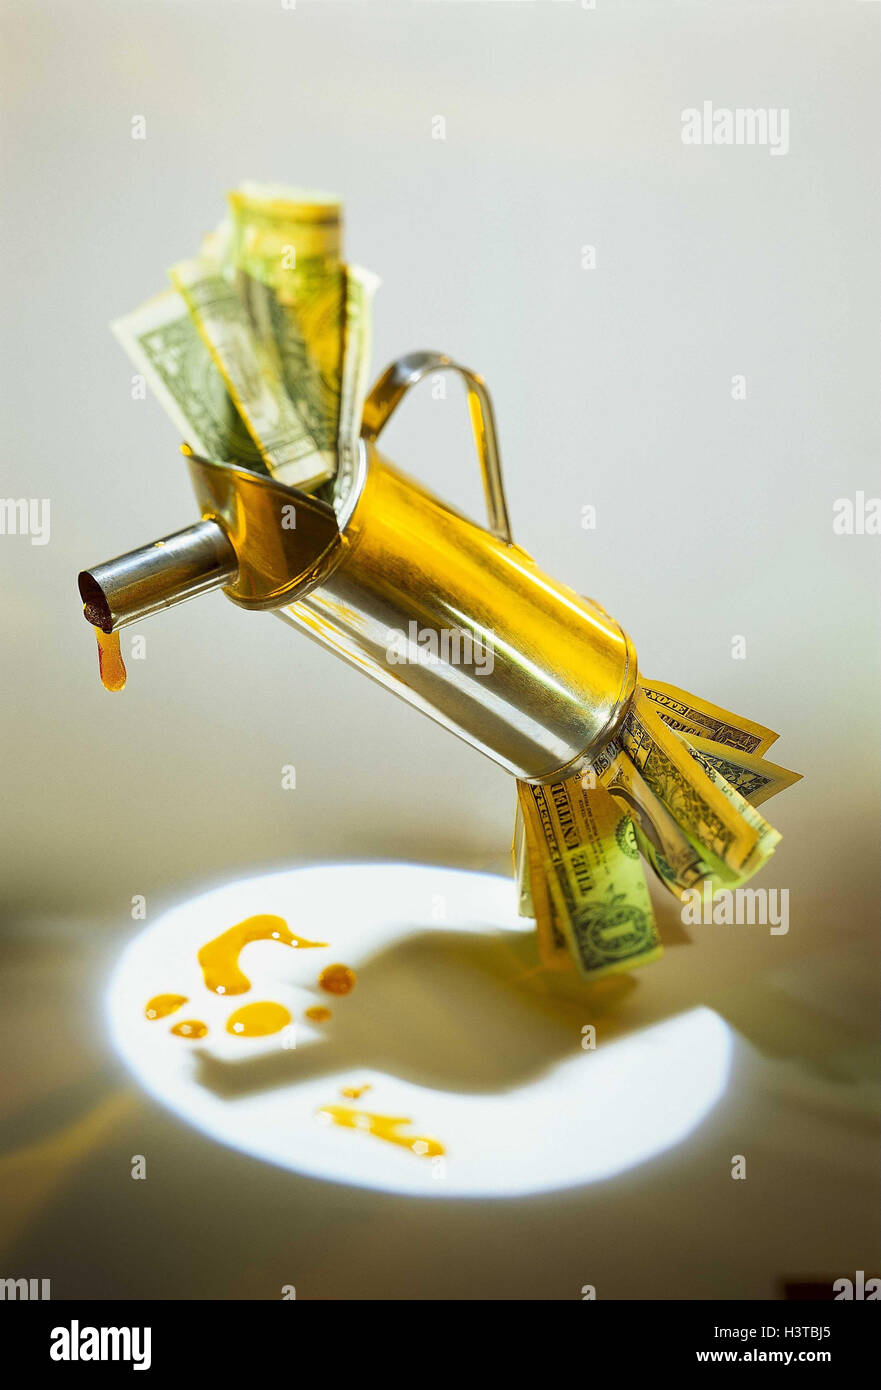 Symbol, Steuer Auf Öl, Projektion, Ölkanne, Banknoten, Dollar, Öl